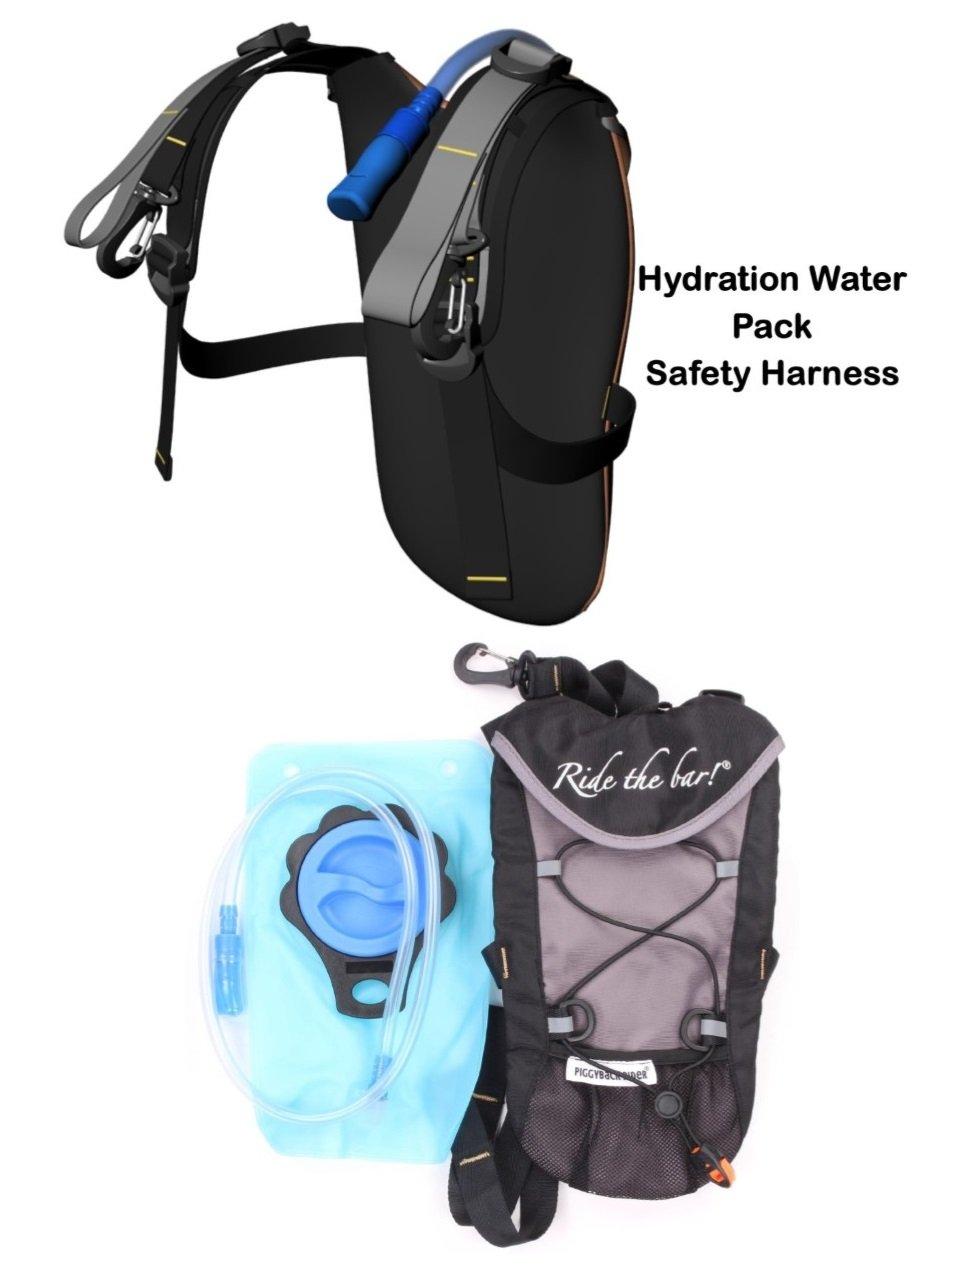 Piggyback Rider SCOUT Model - Standing Child Toddler Carrier Backpack for Hiking Trails, Camping, Fitness Travel (Orange)